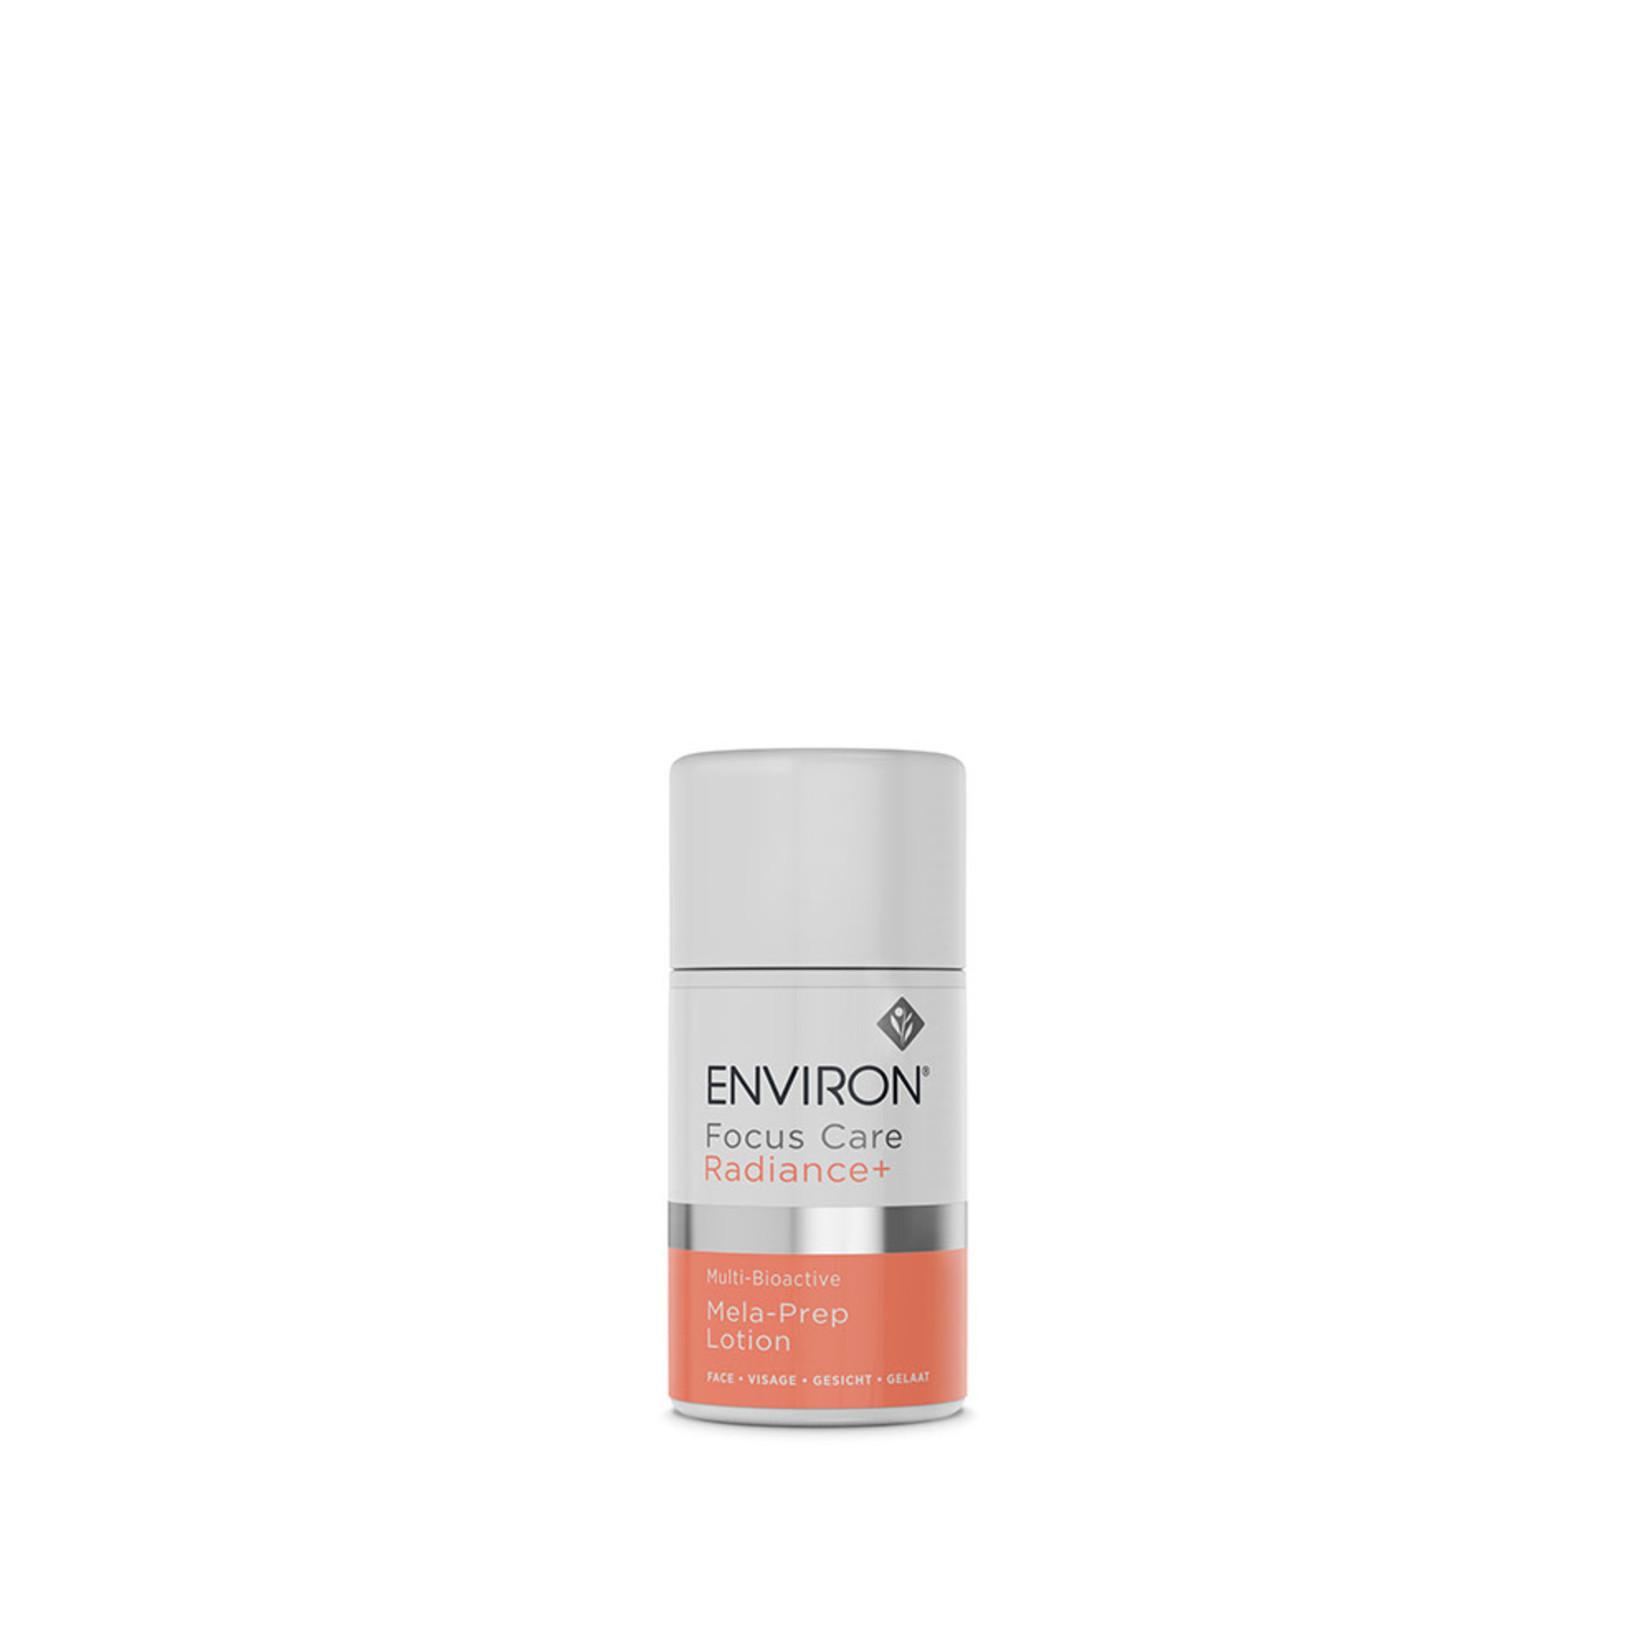 Environ Multi-bioactive mela-prep lotion 60ml